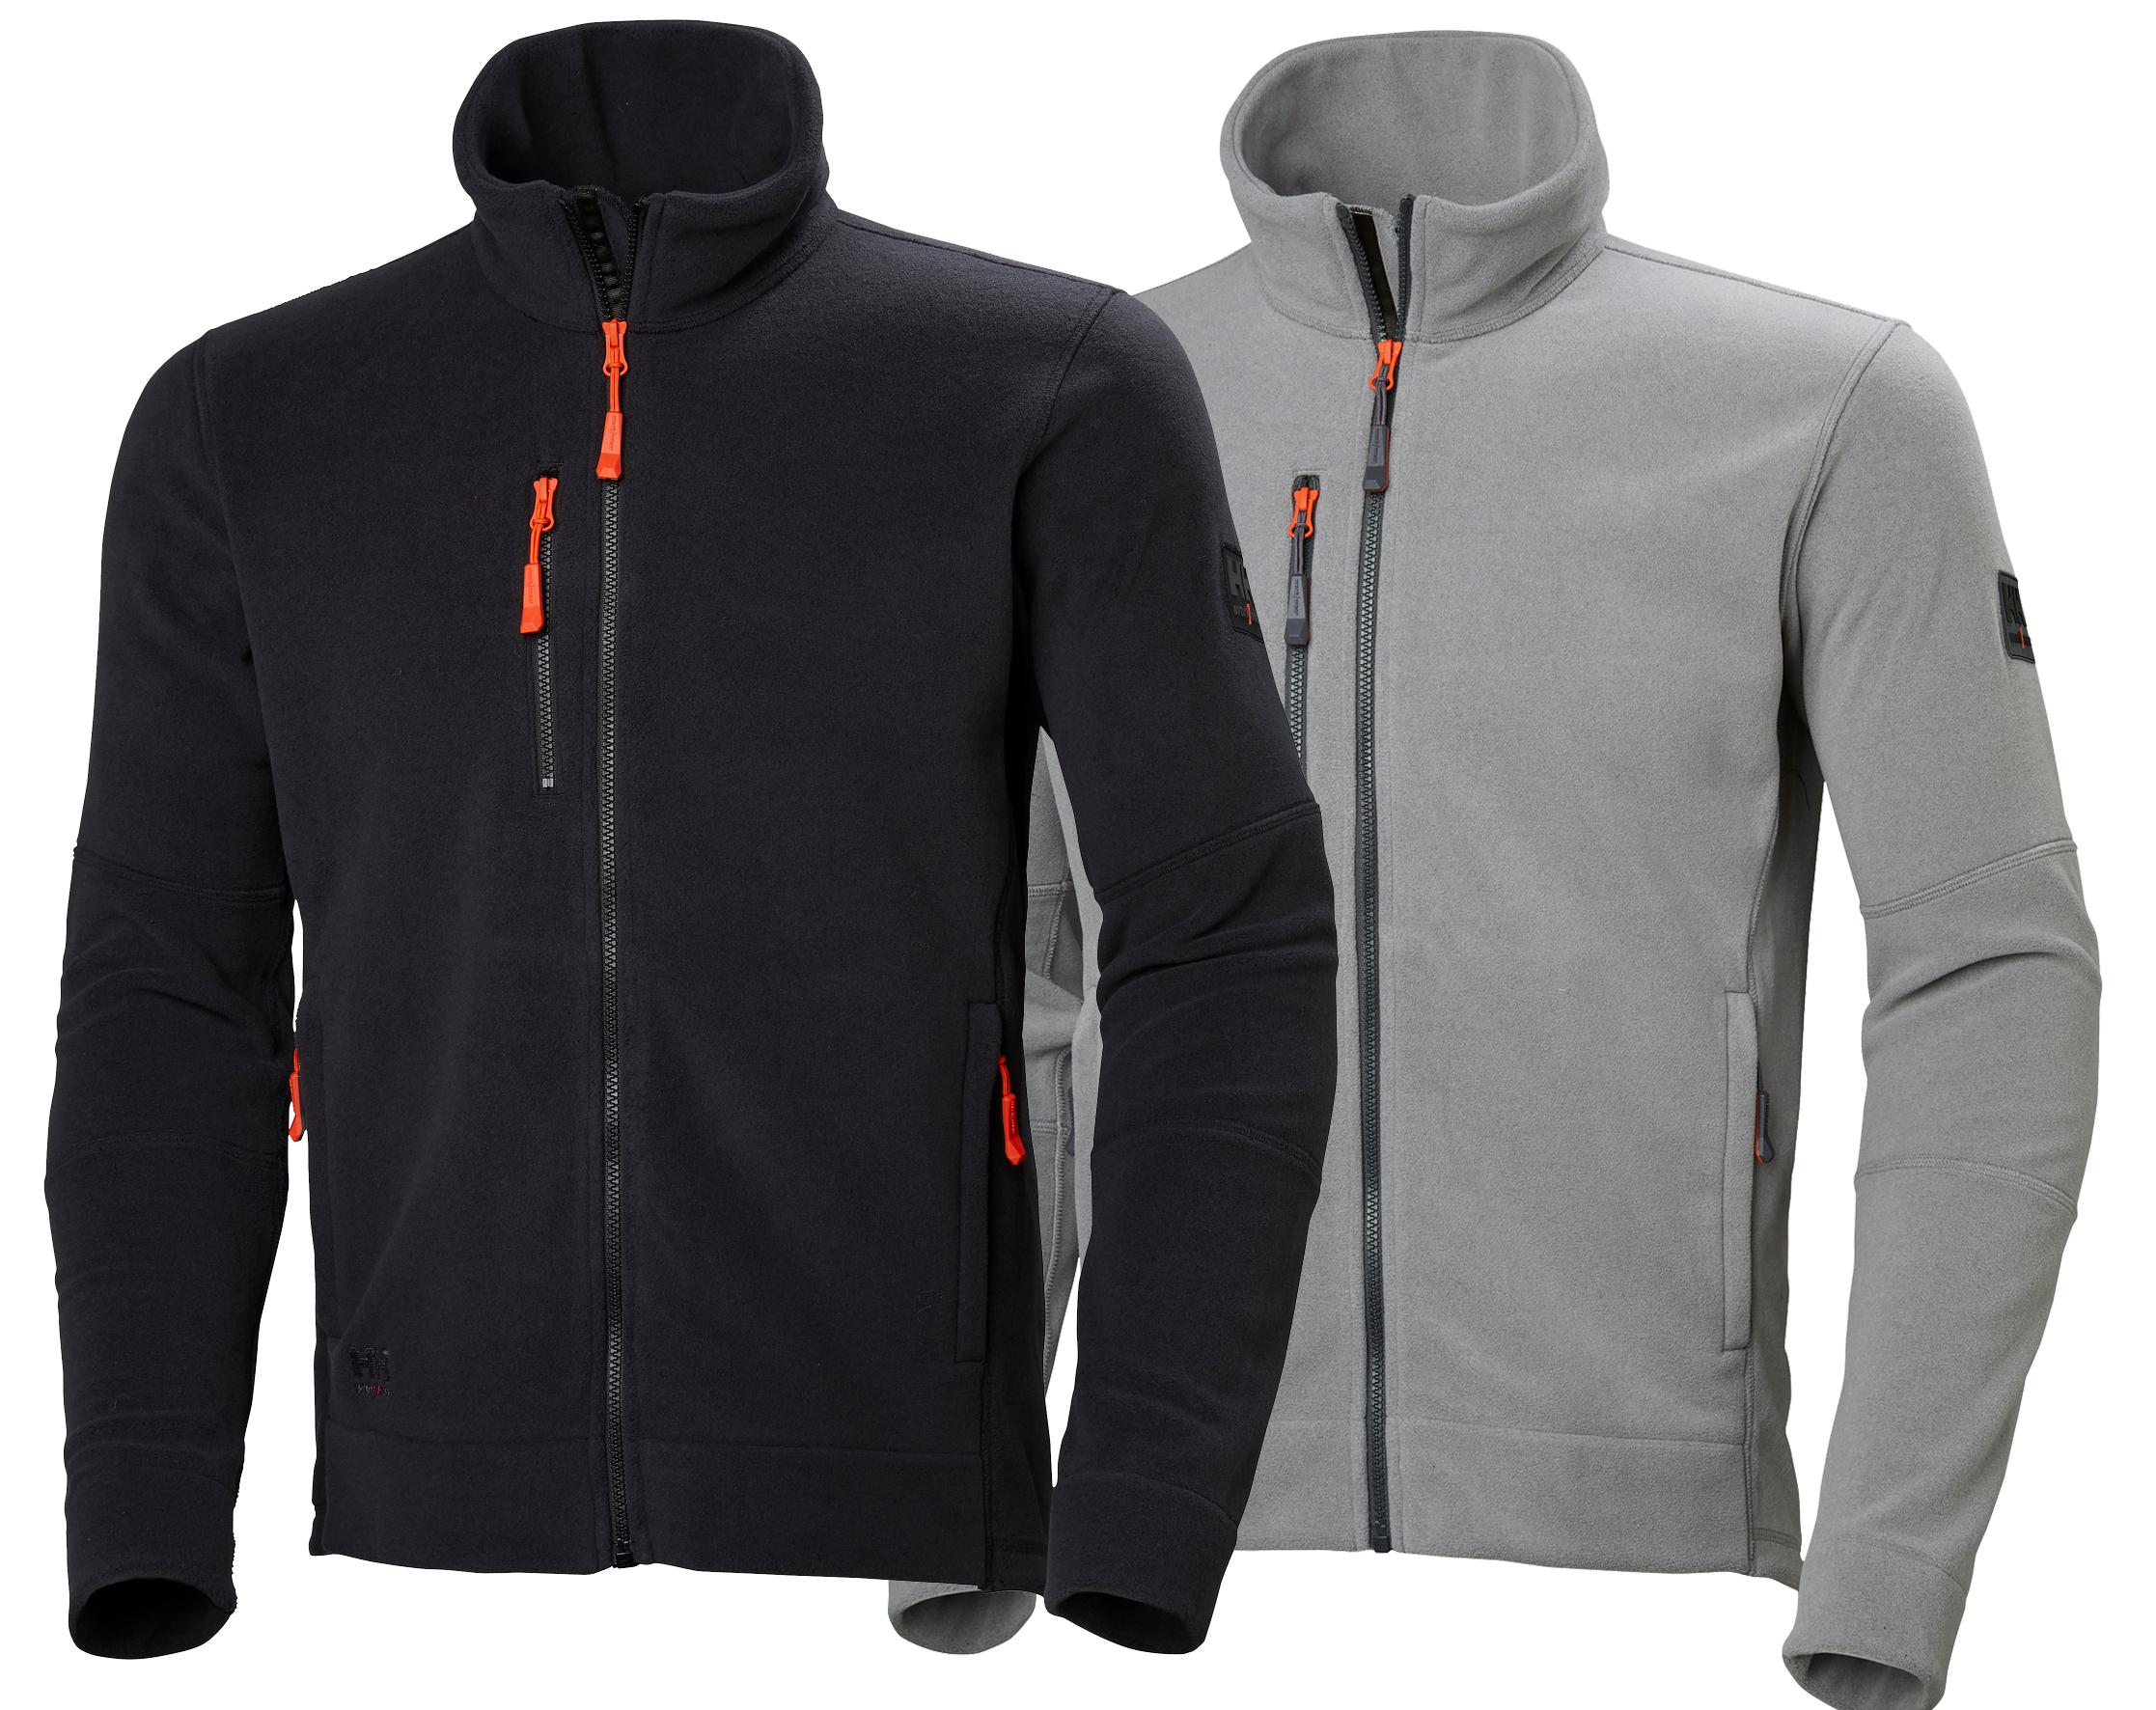 401f2c15 Kingston Fleece Jacket - Helly Hansen 72158, Available Gray and Black